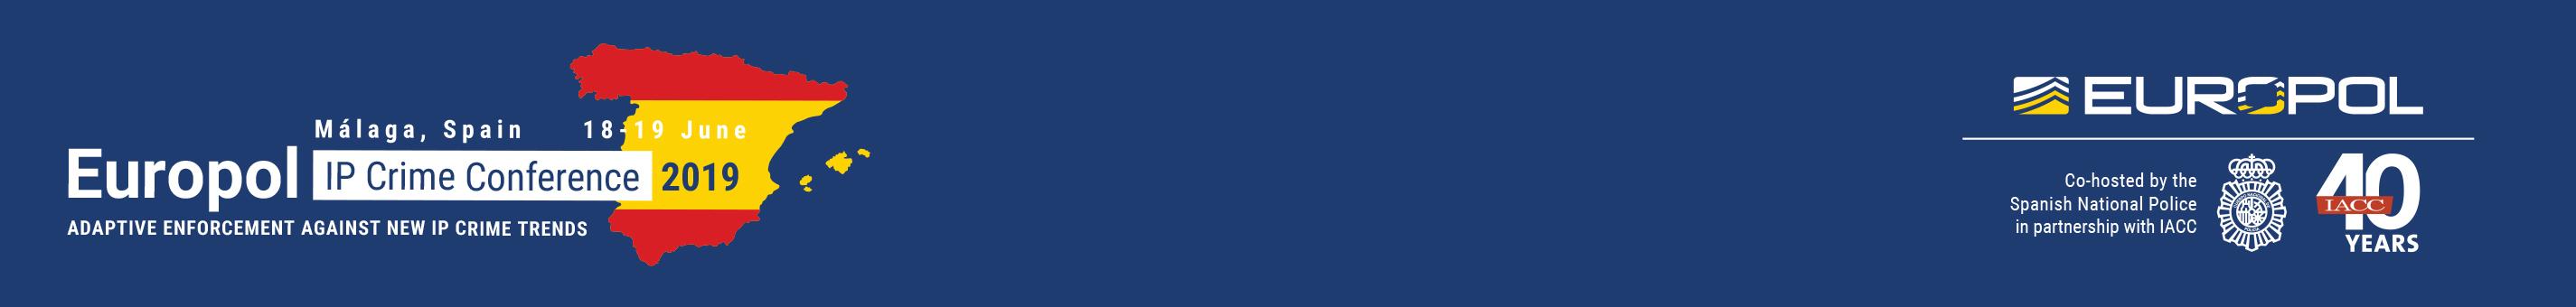 2019 Europol IP Crime Conference